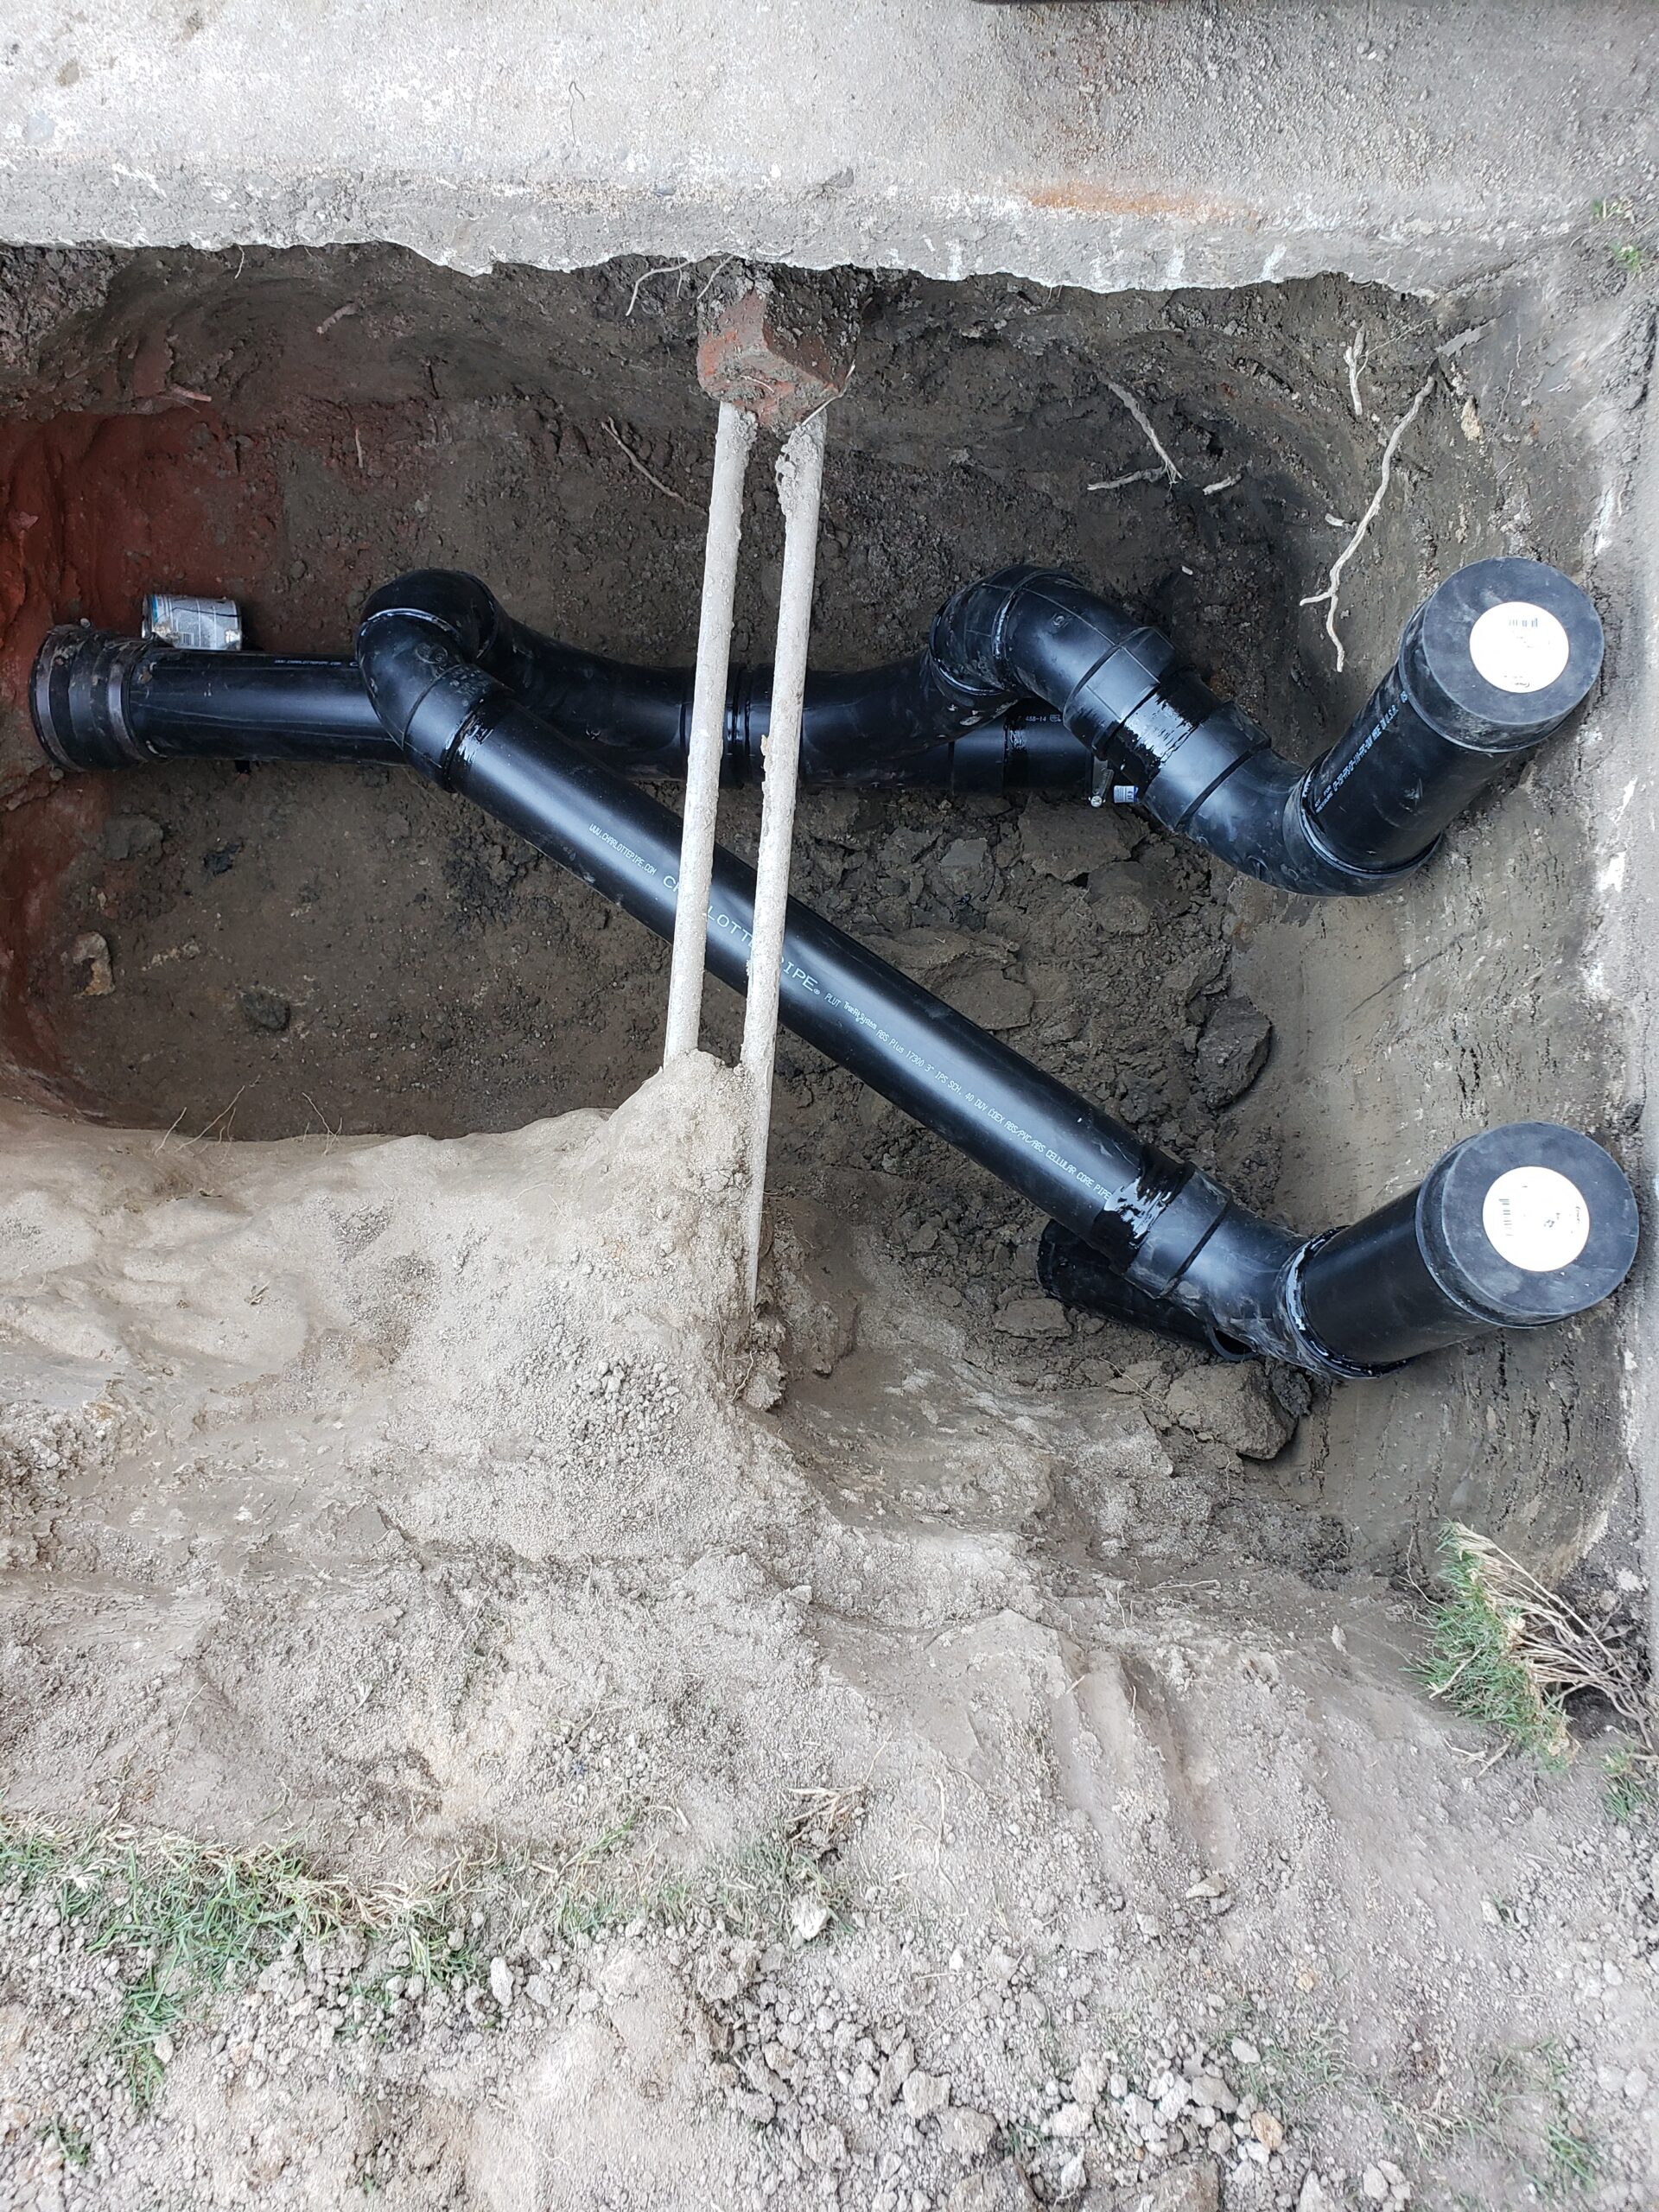 PlumbAbove Sewer Repair Plumbing Service in Phoenix, AZ